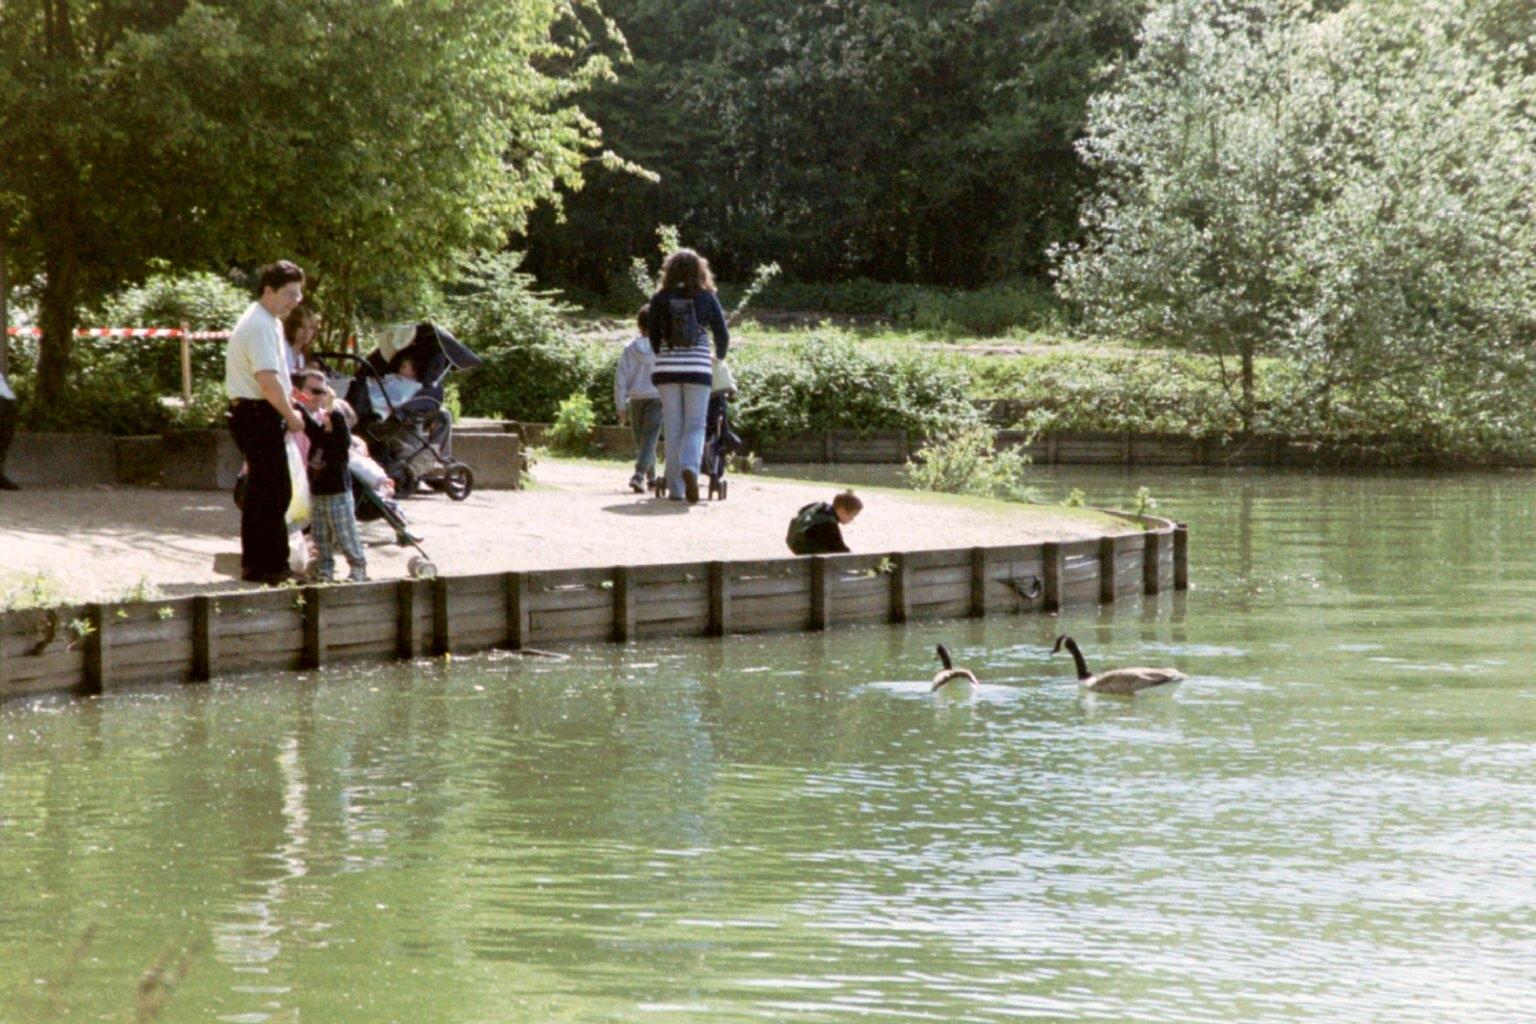 Parcs et for ts des yvelines yvelines tourisme for Yvelines sortir